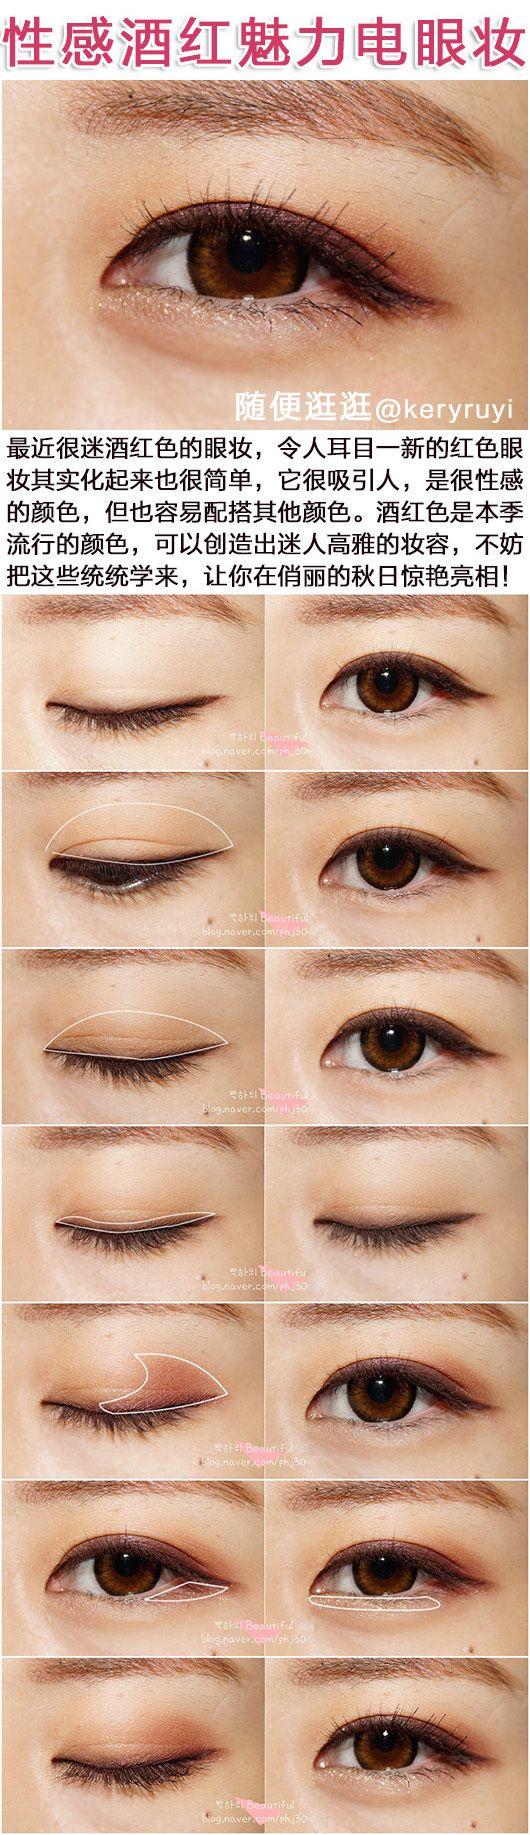 Asian make up tutorial korean makeuphairstyle pinterest asian eye makeup baditri Image collections